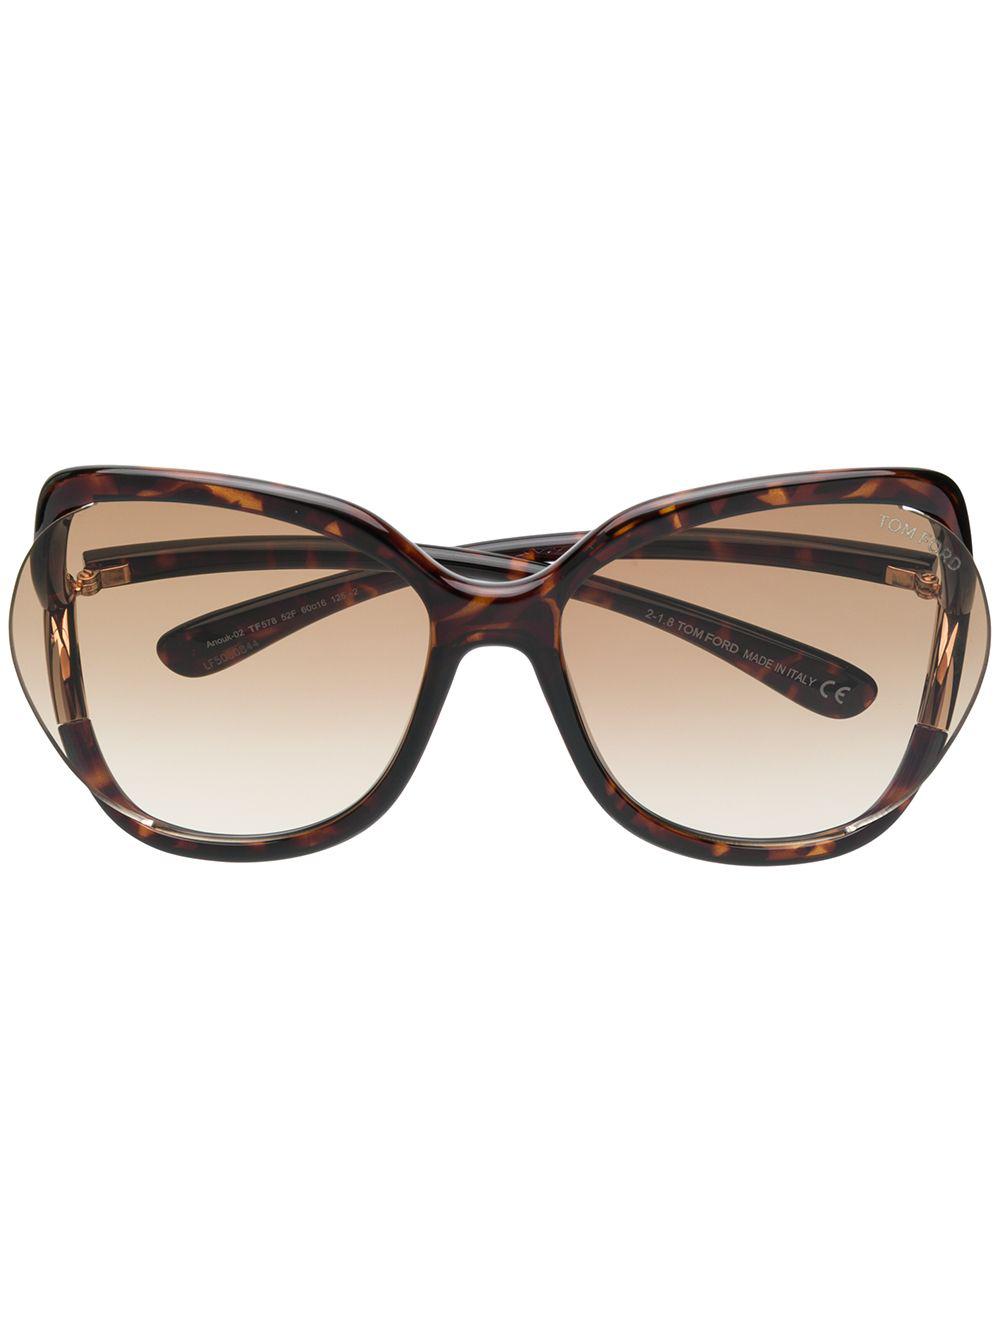 84f1b626d5a8 TOM FORD. Tom Ford Eyewear Anquk 02 Sunglasses ...